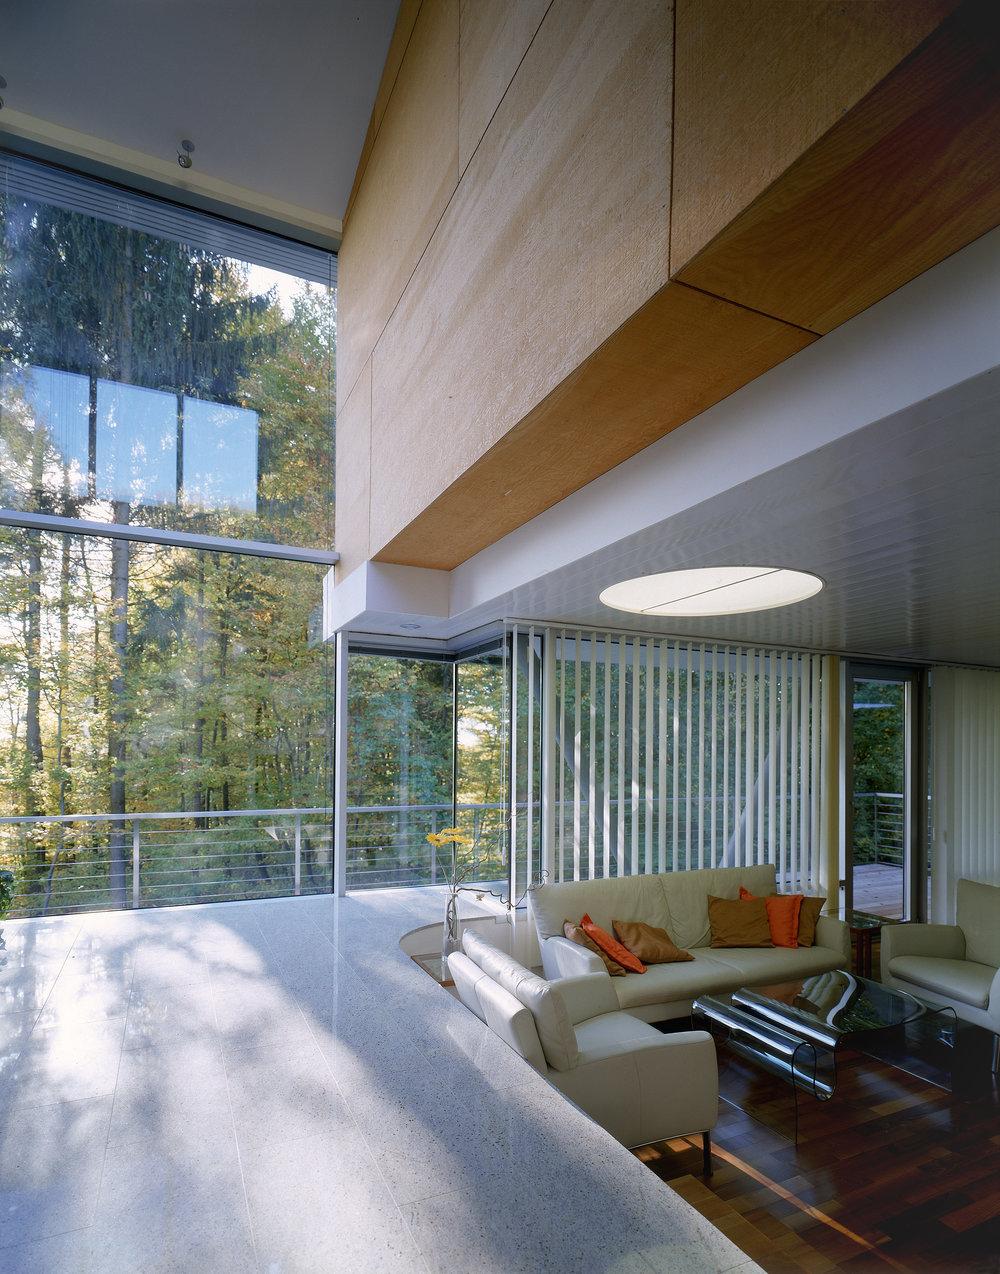 A01 architects - Residence Eiser_(c) Nadine Blanchard__web03jpg